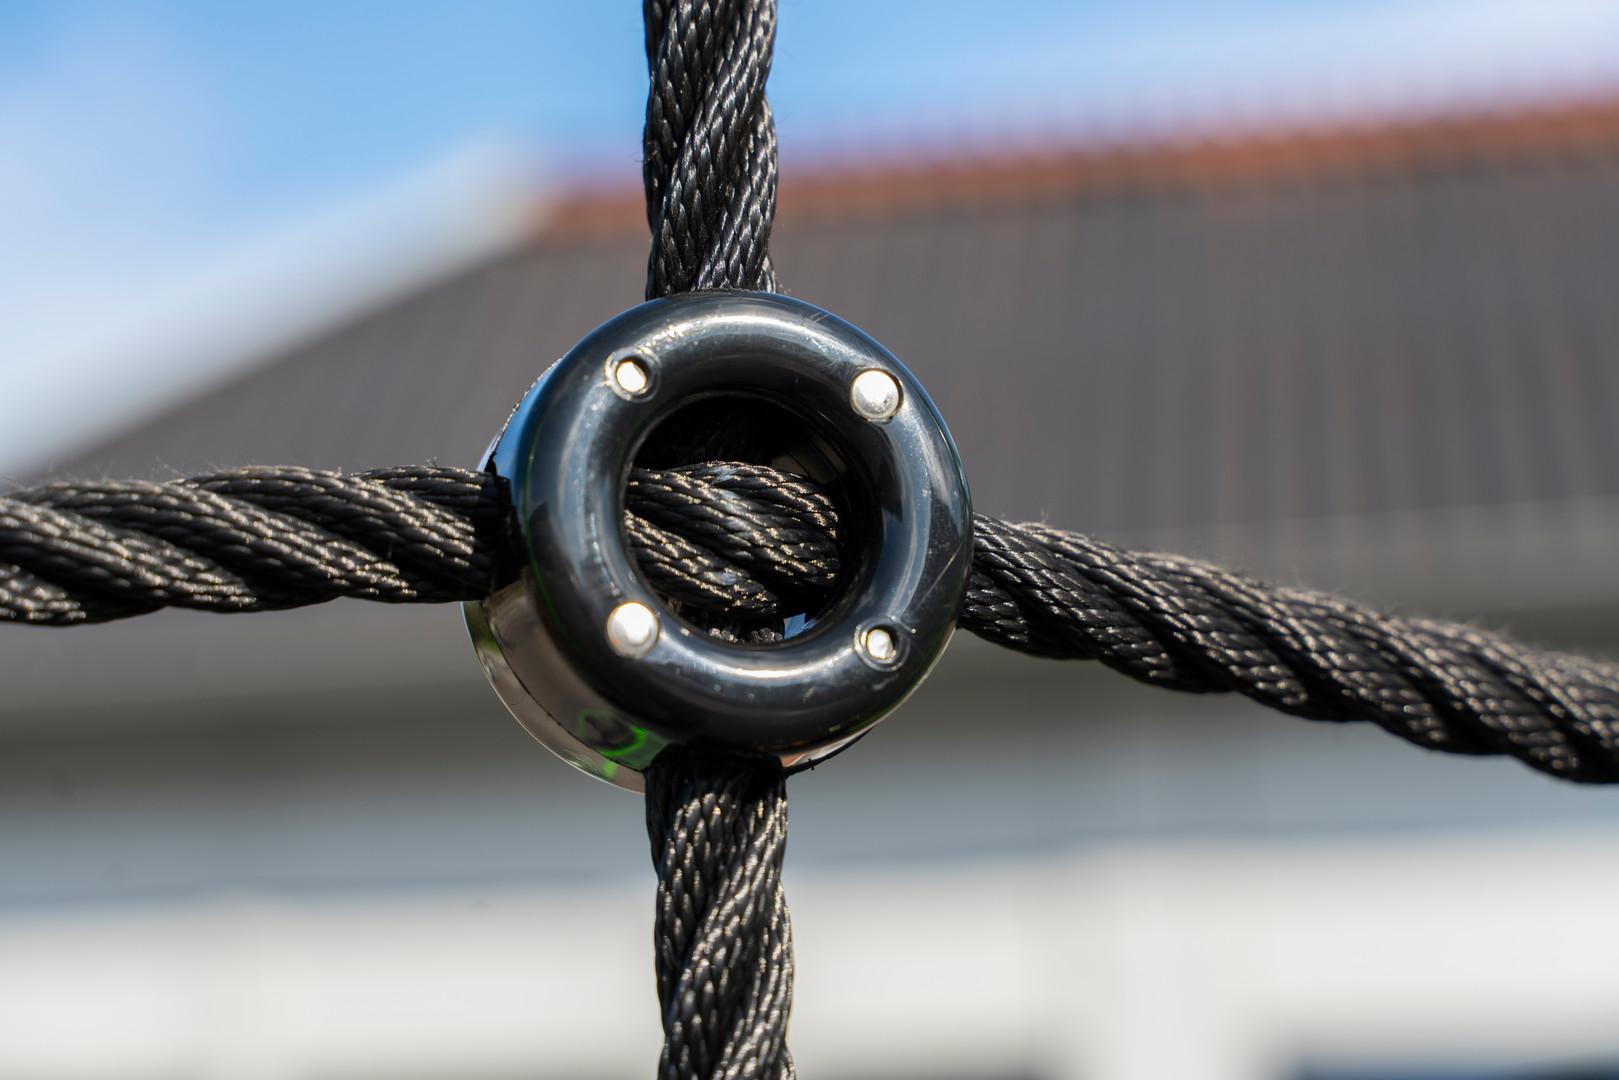 FSW103_DK_rope_connector.jpg